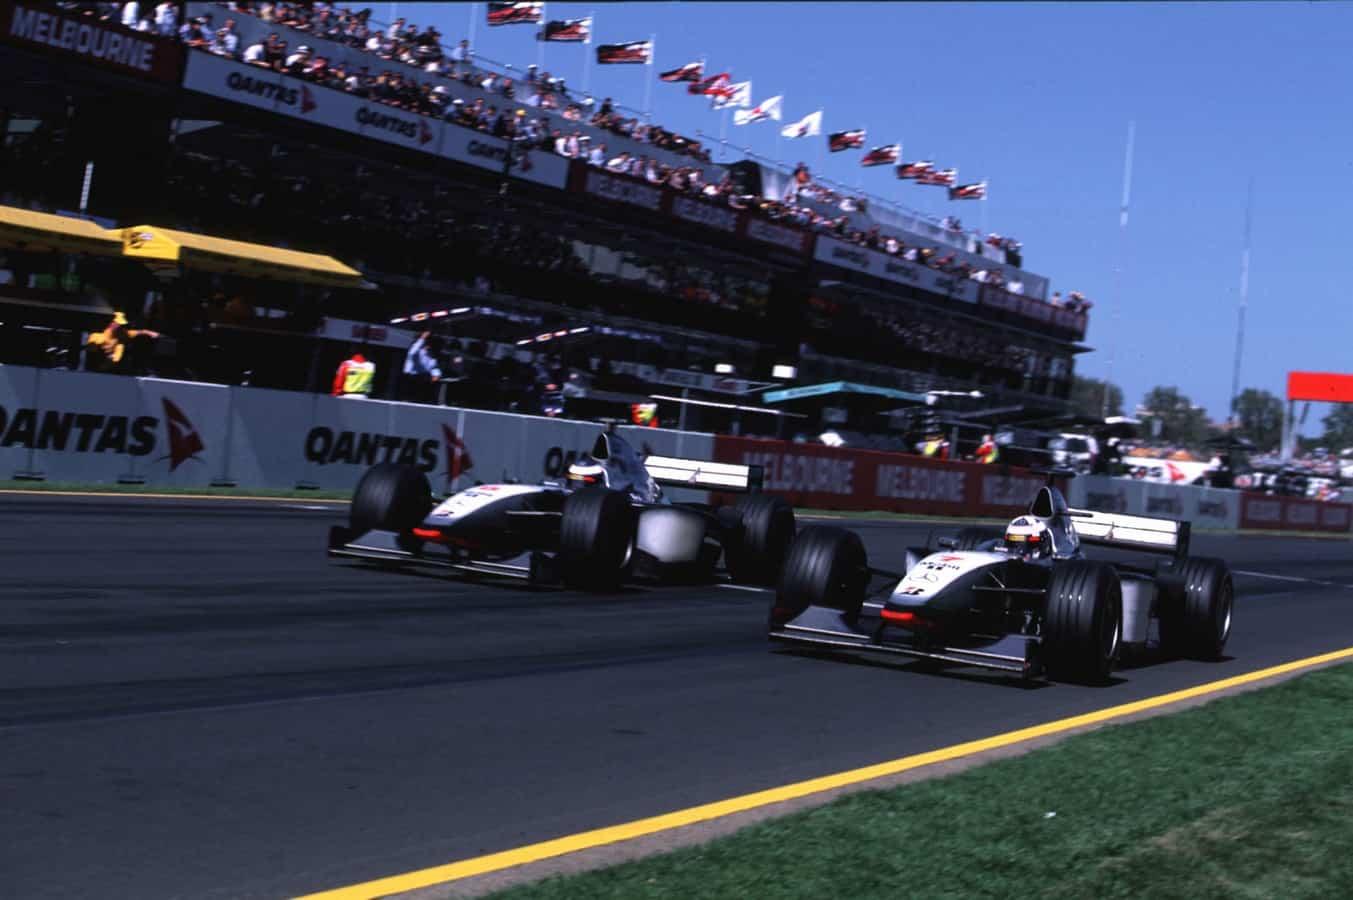 1998-Australian-GP-Coulthard-and-Hakkinen Photo McLaren